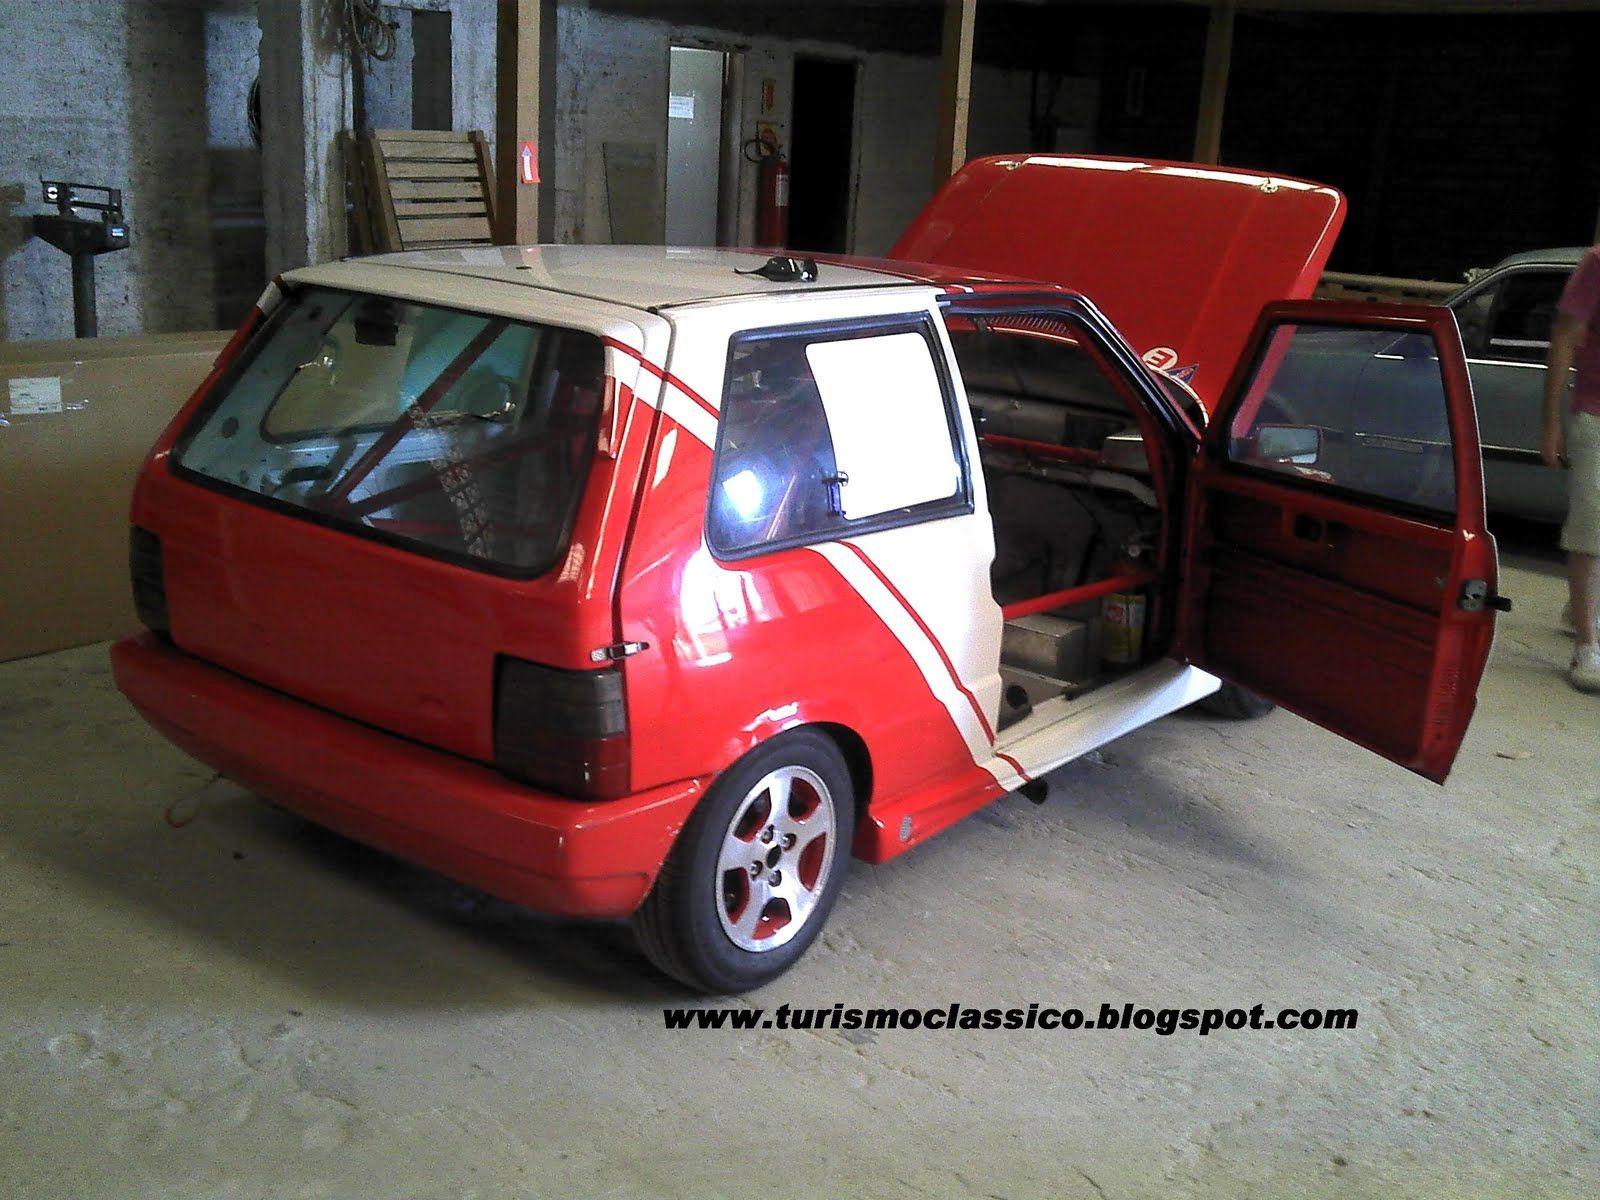 Fiat Garage Arnhem : Fiat uno turbo i e race car classic cars fiat uno